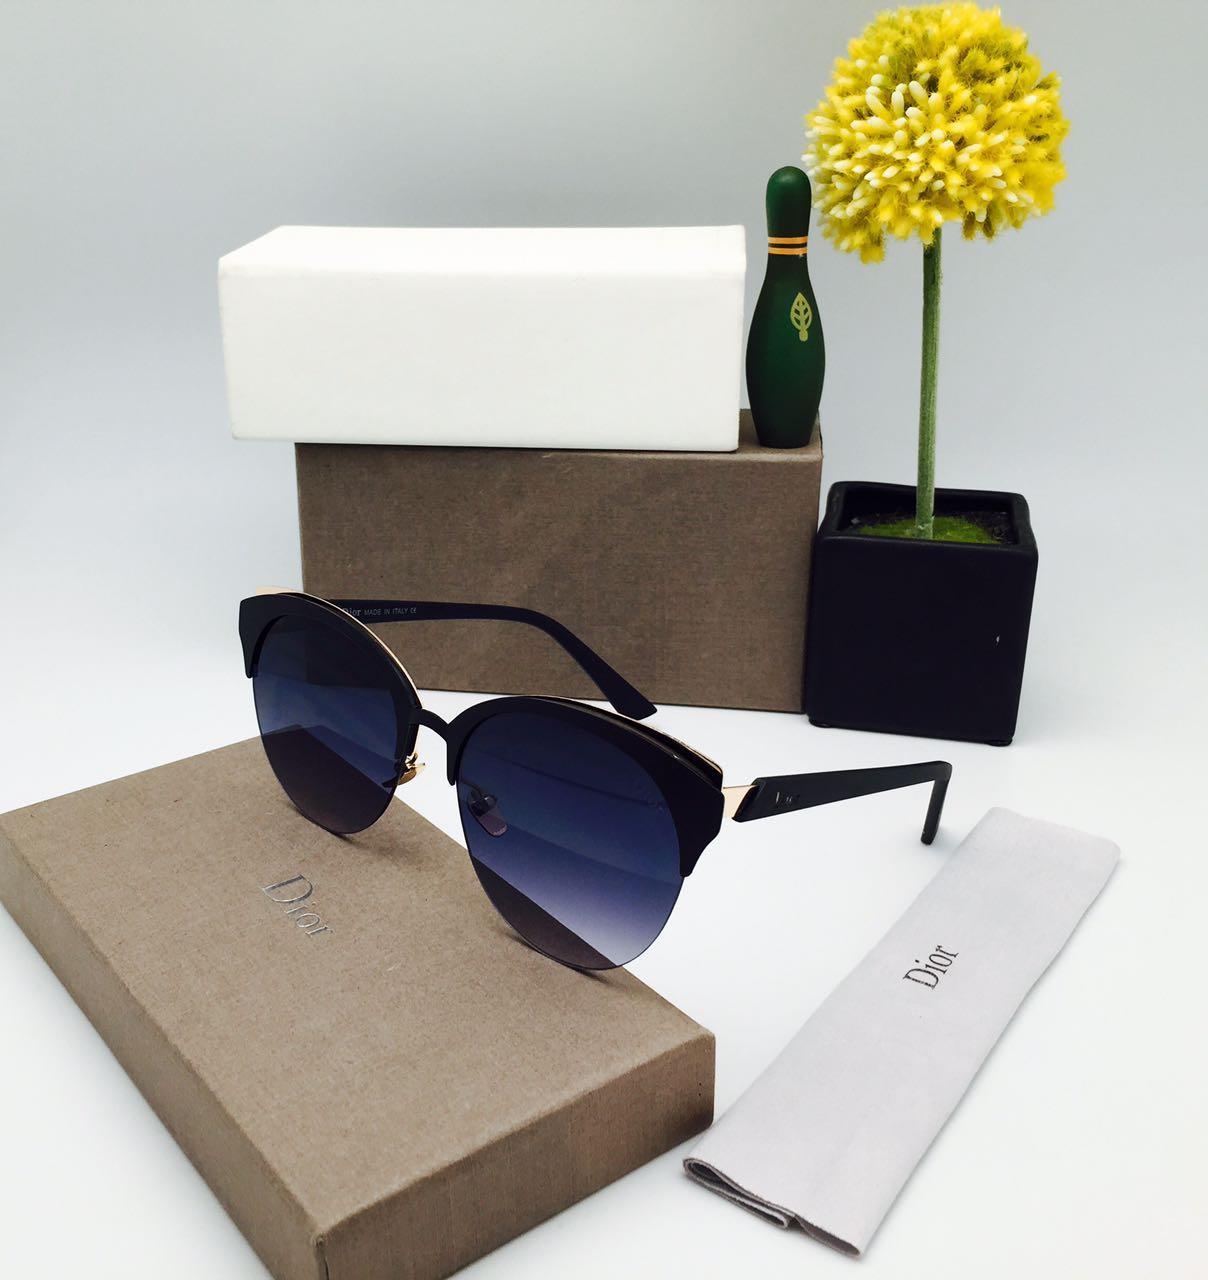 Daftar Harga Kacamata Dior Terbaru Bulan November 2018 Www Sunglass Wanita 84 Cewe 17012 Pink Box Fashion New